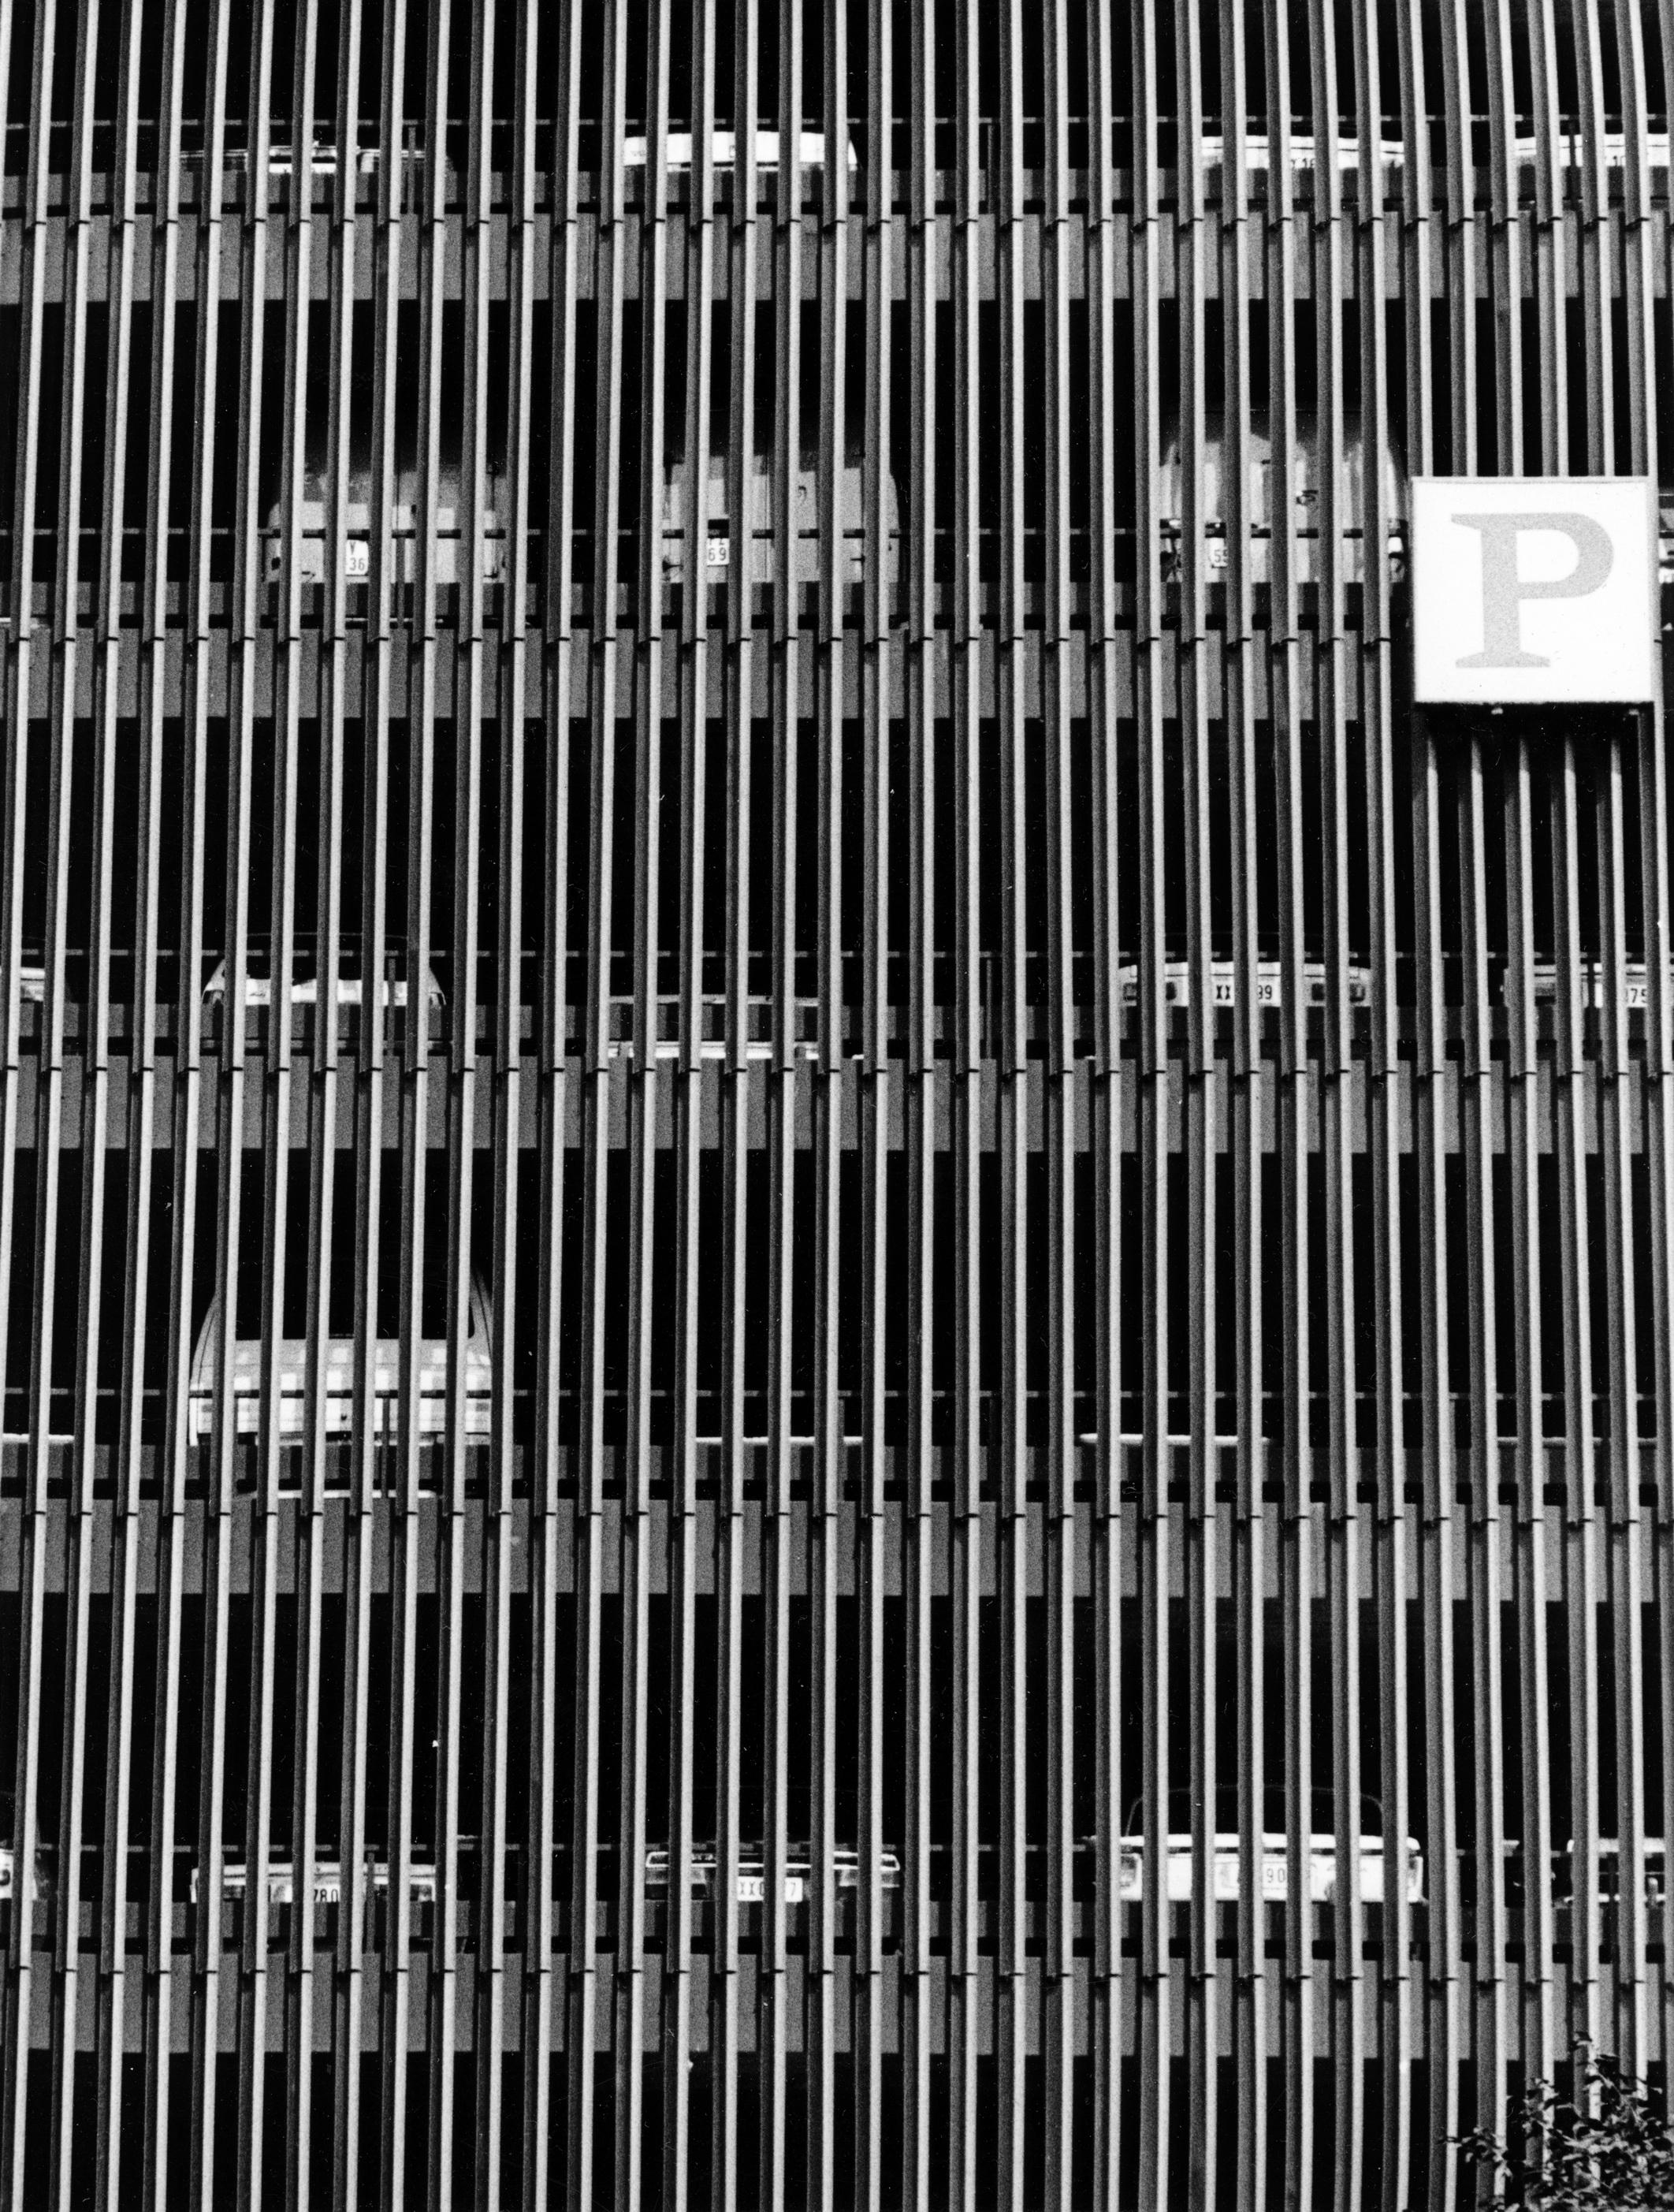 interag-1981korul-fortepan_hu-165032-herpaygabor.jpg